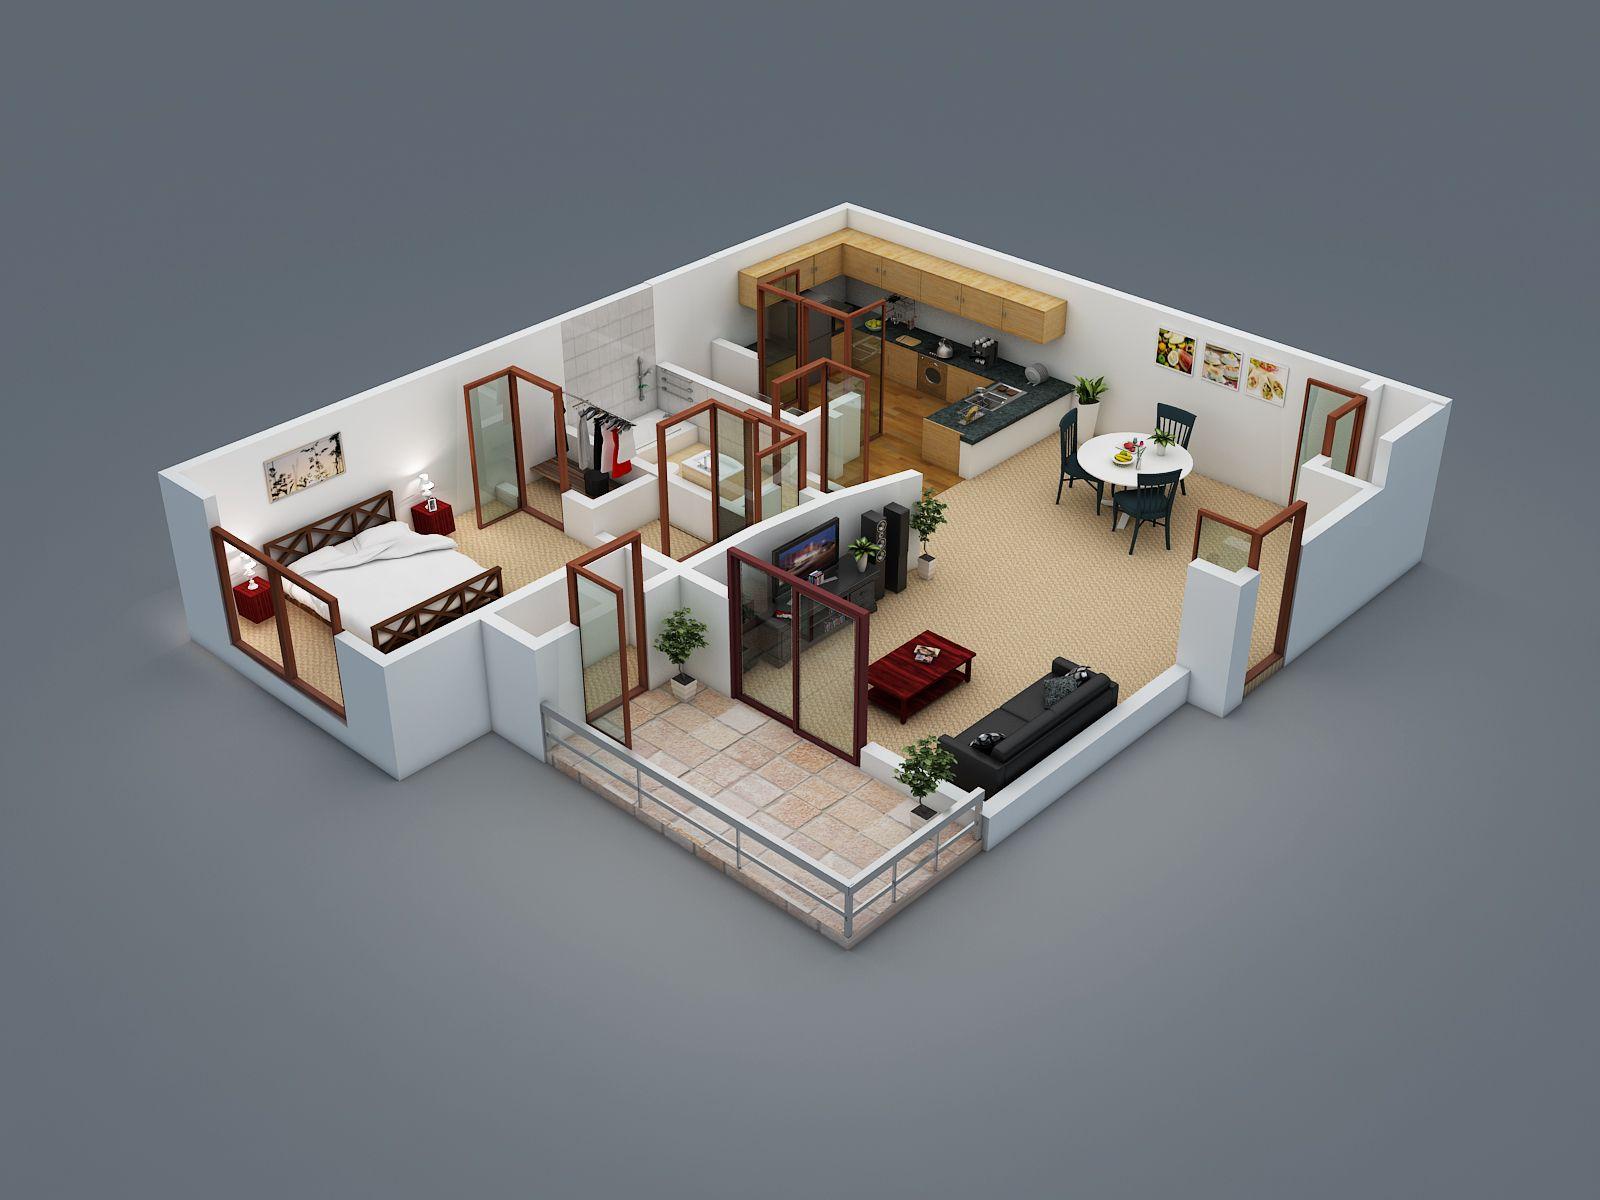 3D Floor Plan Services  Architectural 3D Floor Plan